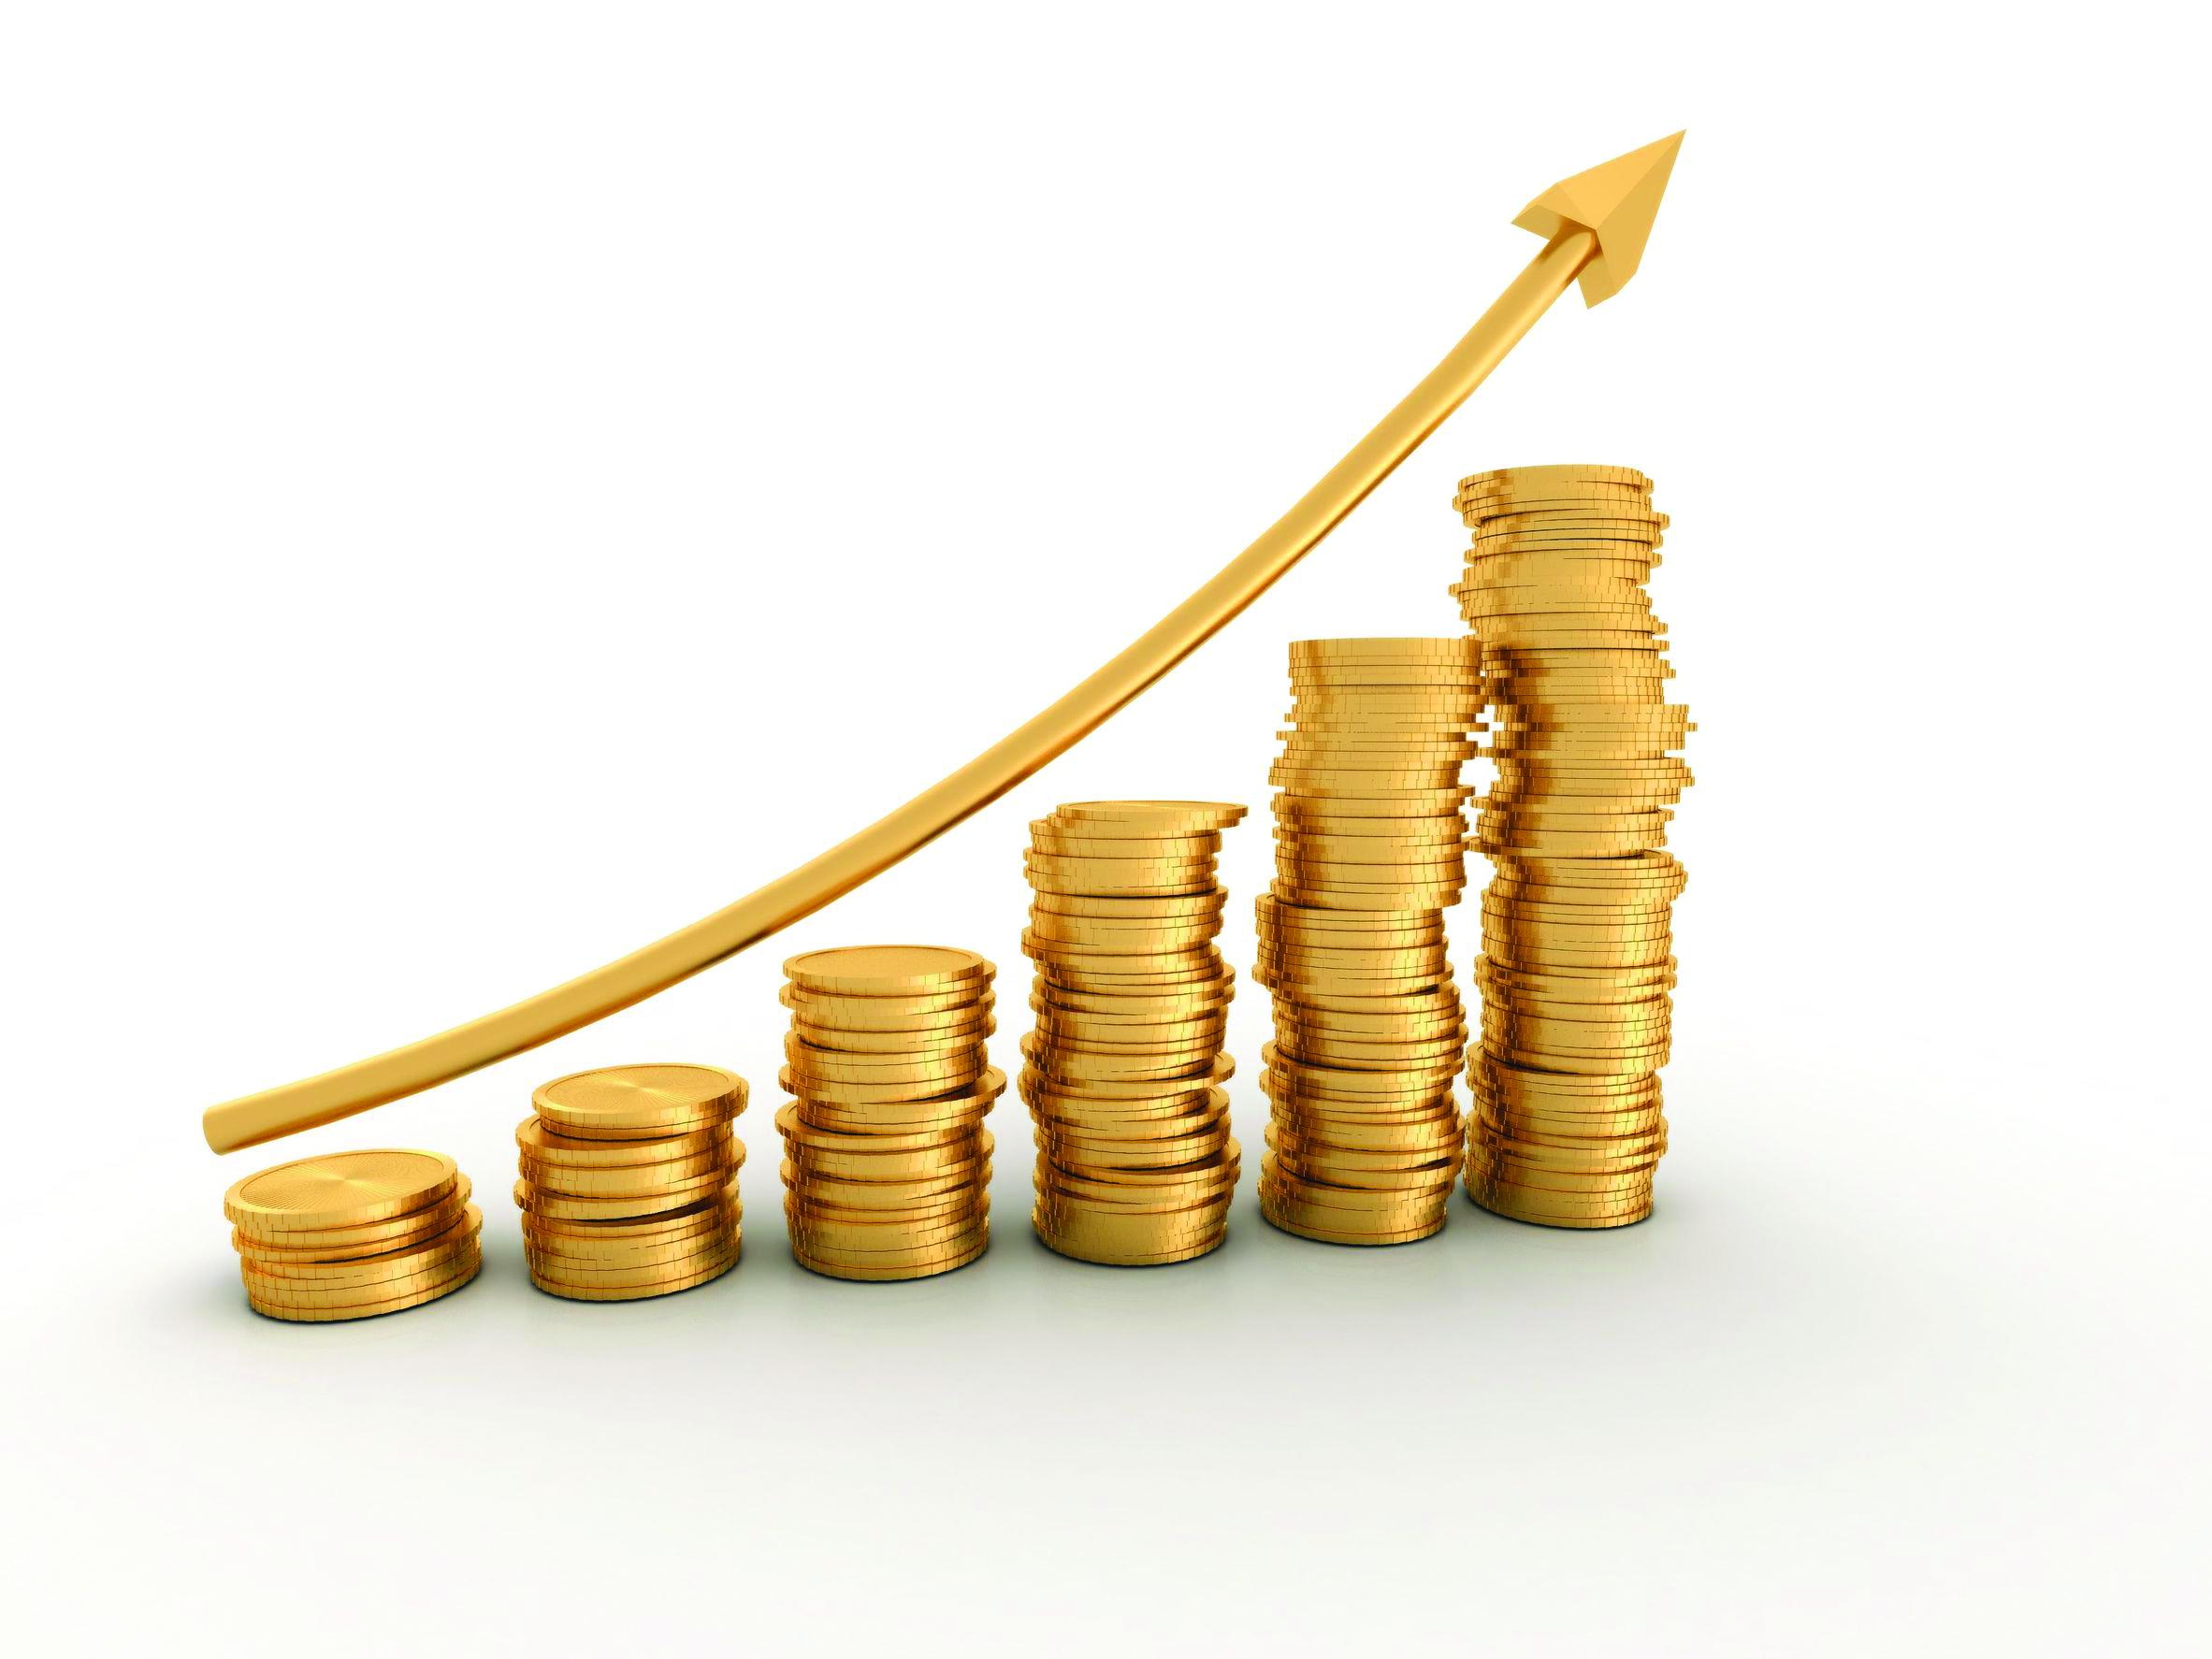 NAB raises home loan interest rates